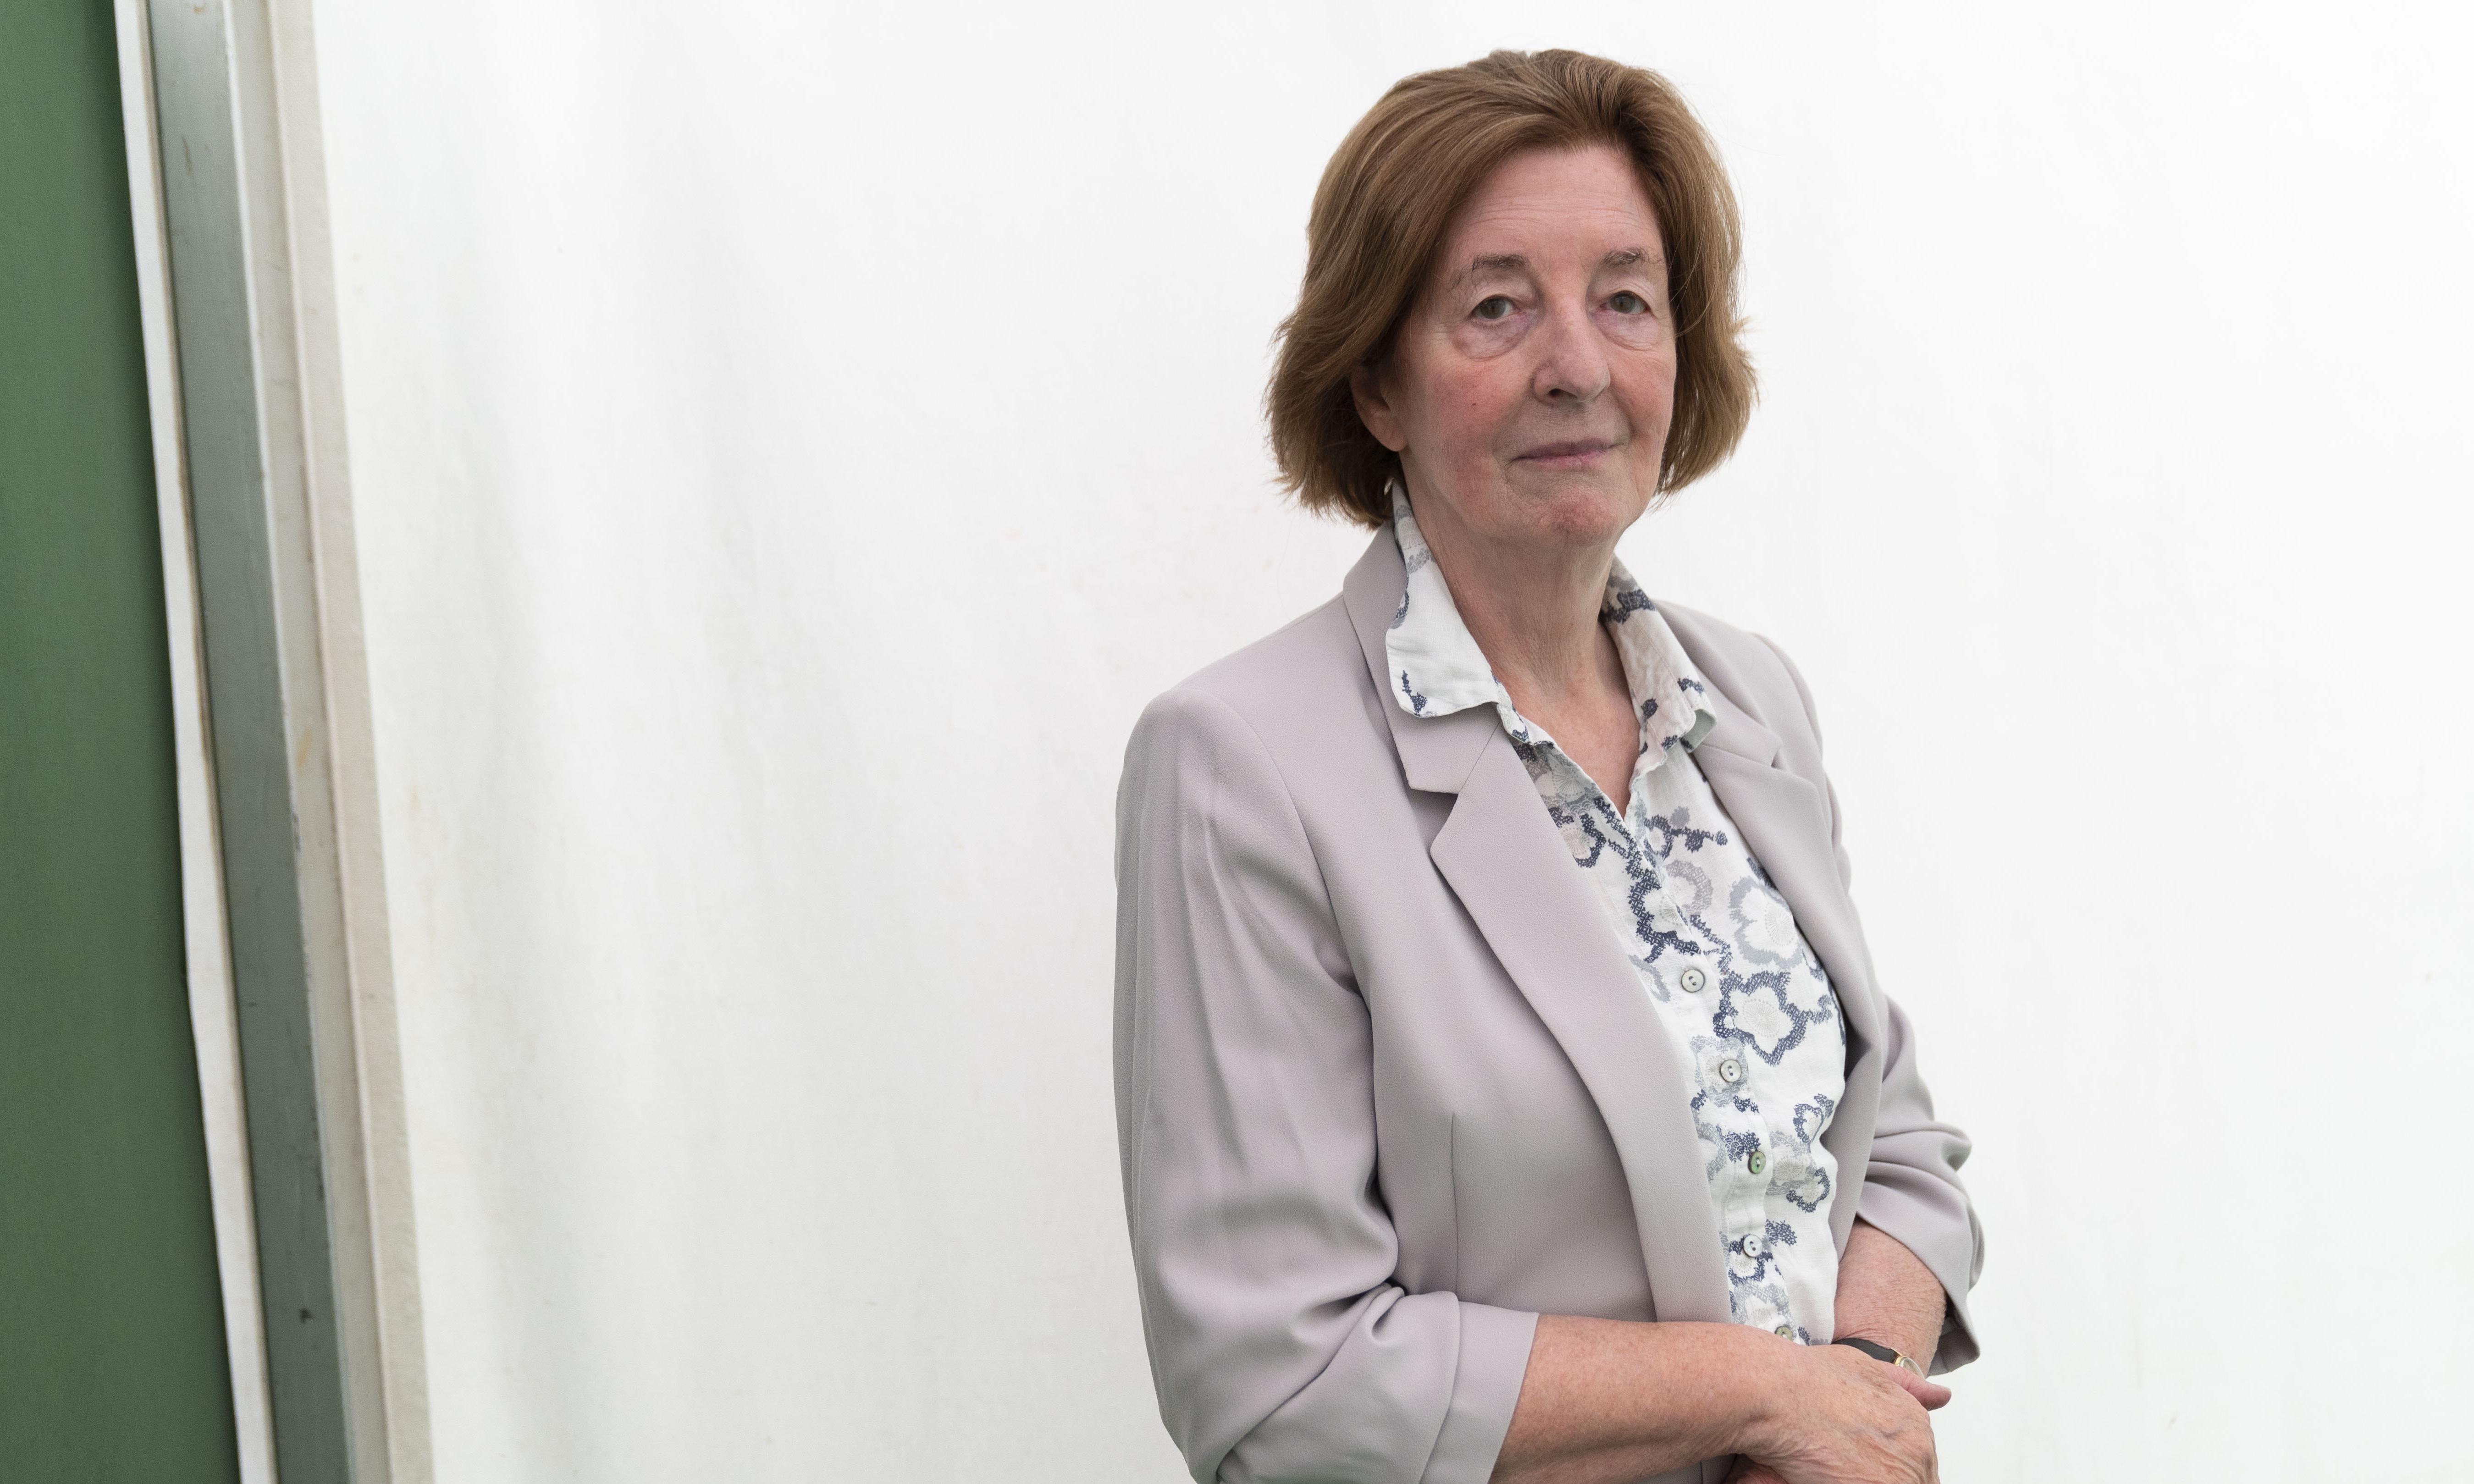 Novelist Pat Barker hits out at 'fashionable' diversity schemes